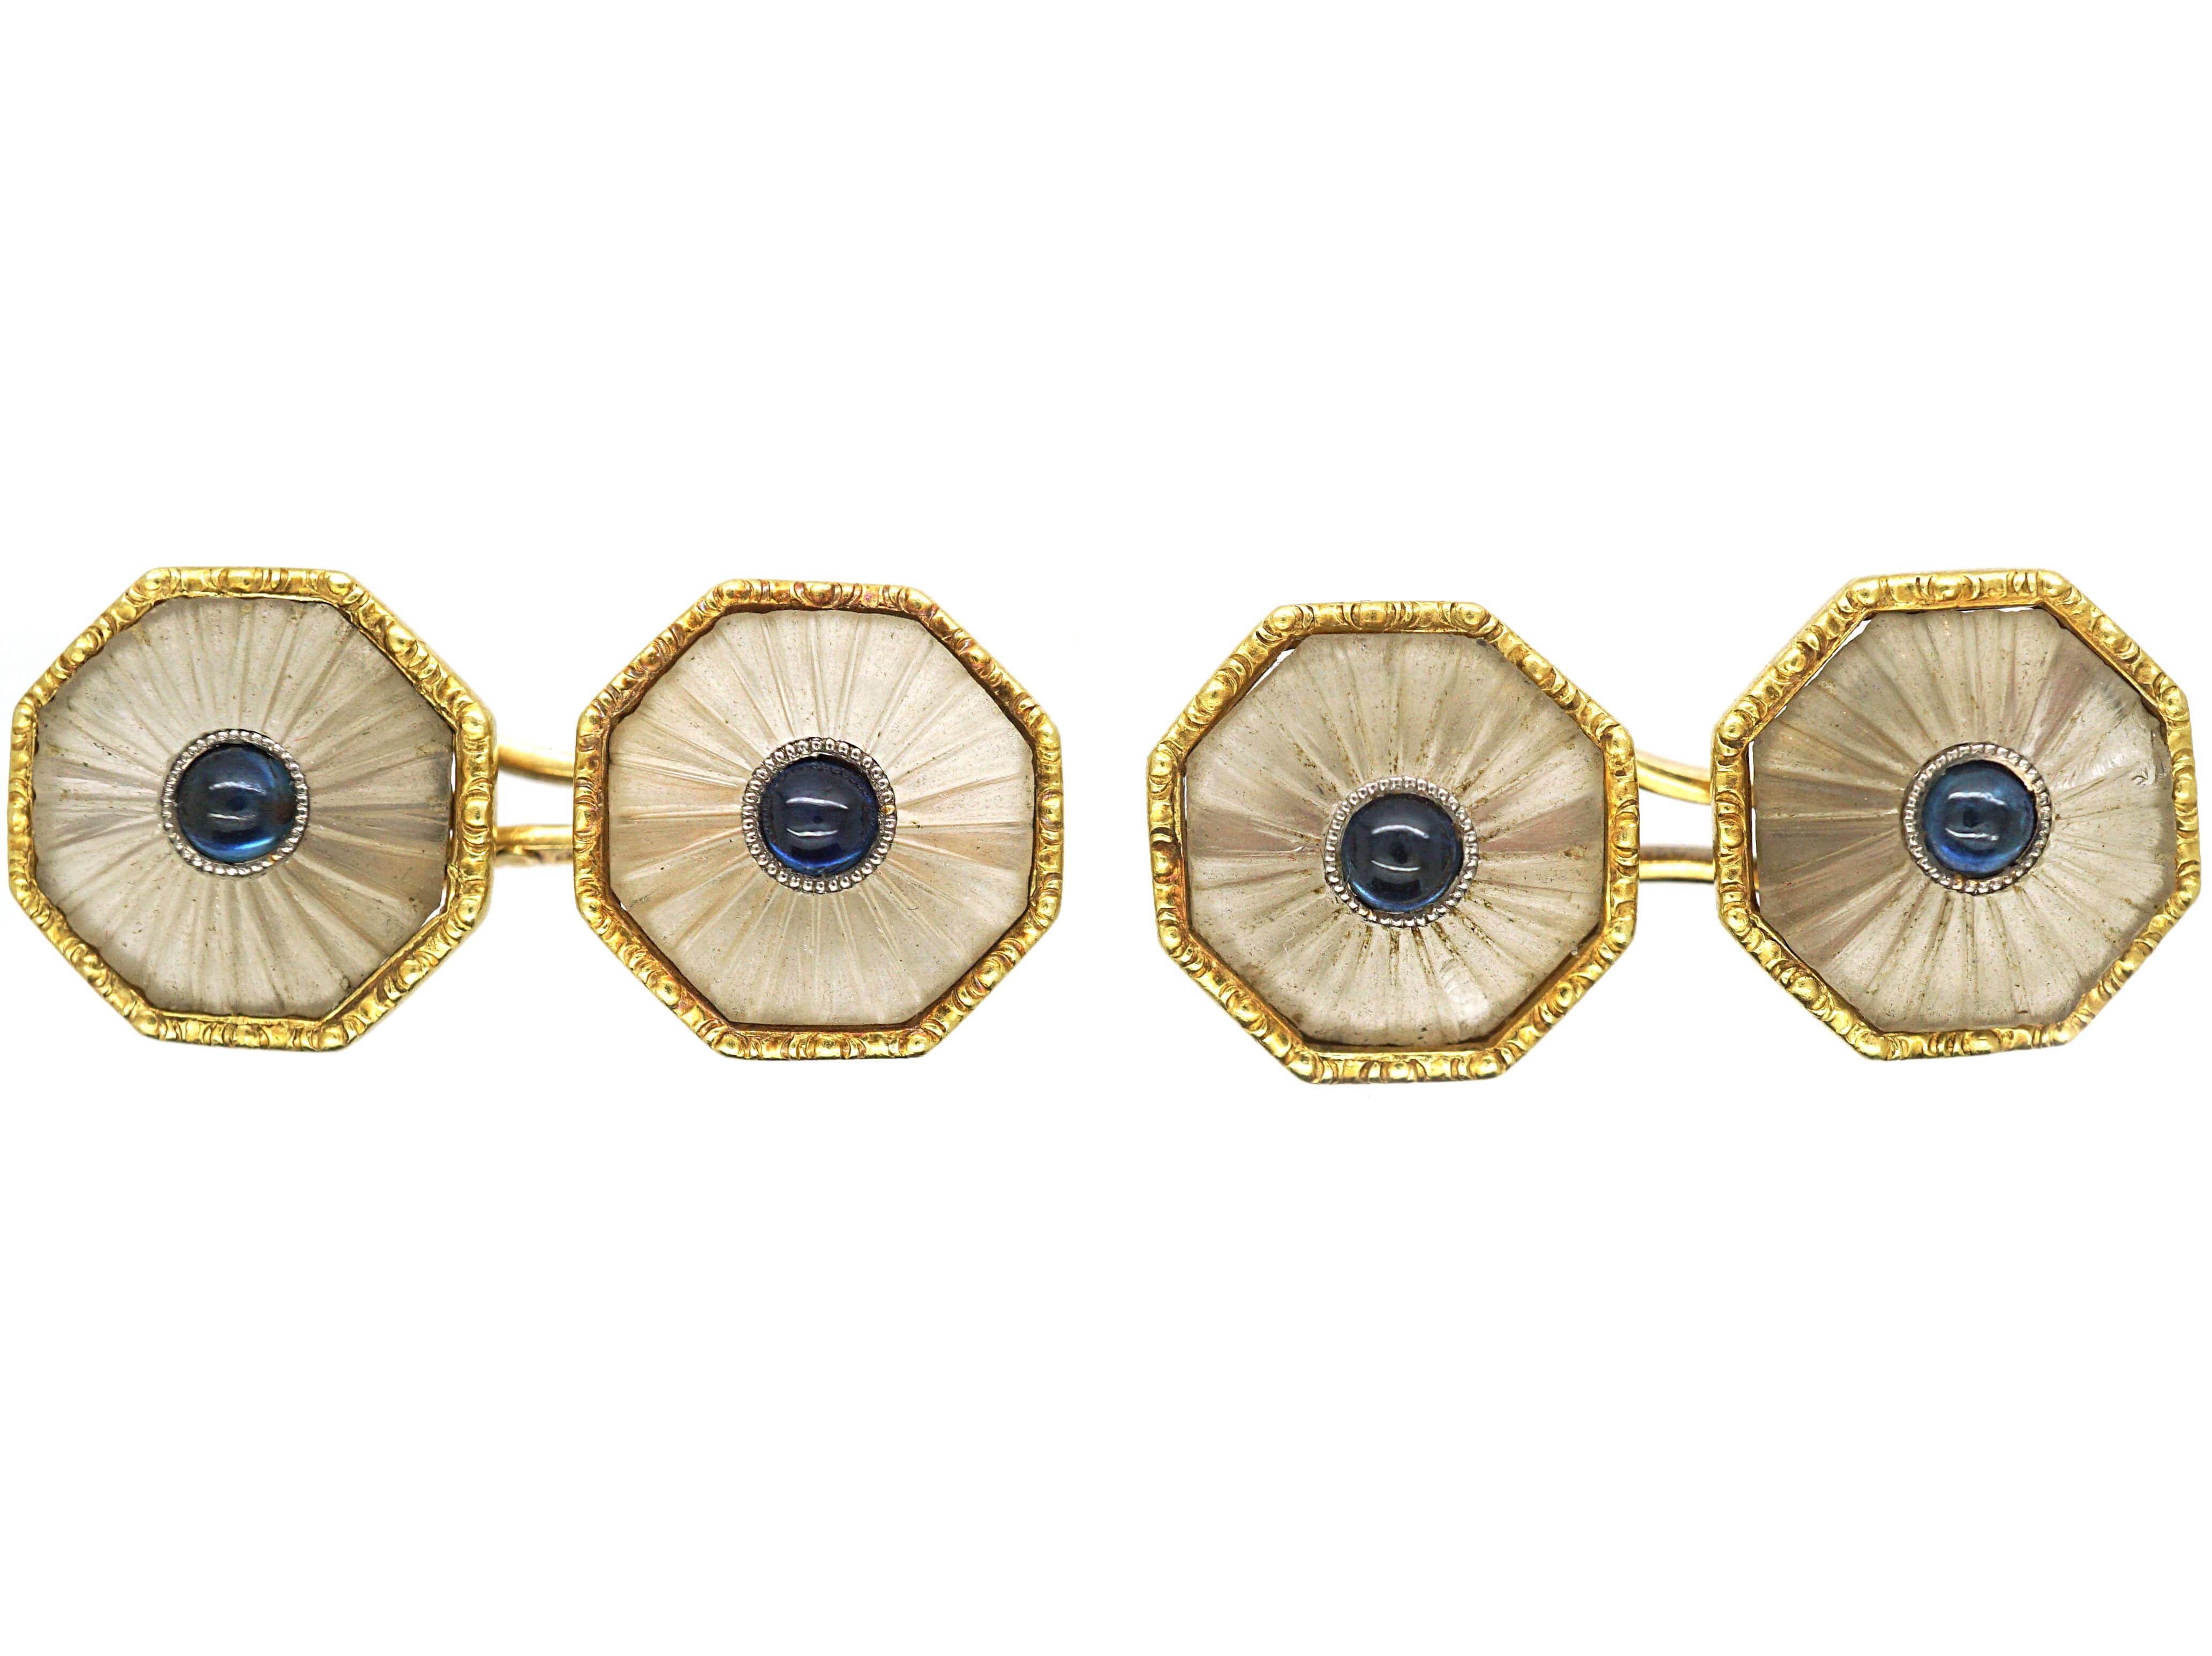 Art Deco 18ct Gold, Rock Crystal & Cabochon Sapphire Octagonal Shaped Cufflinks